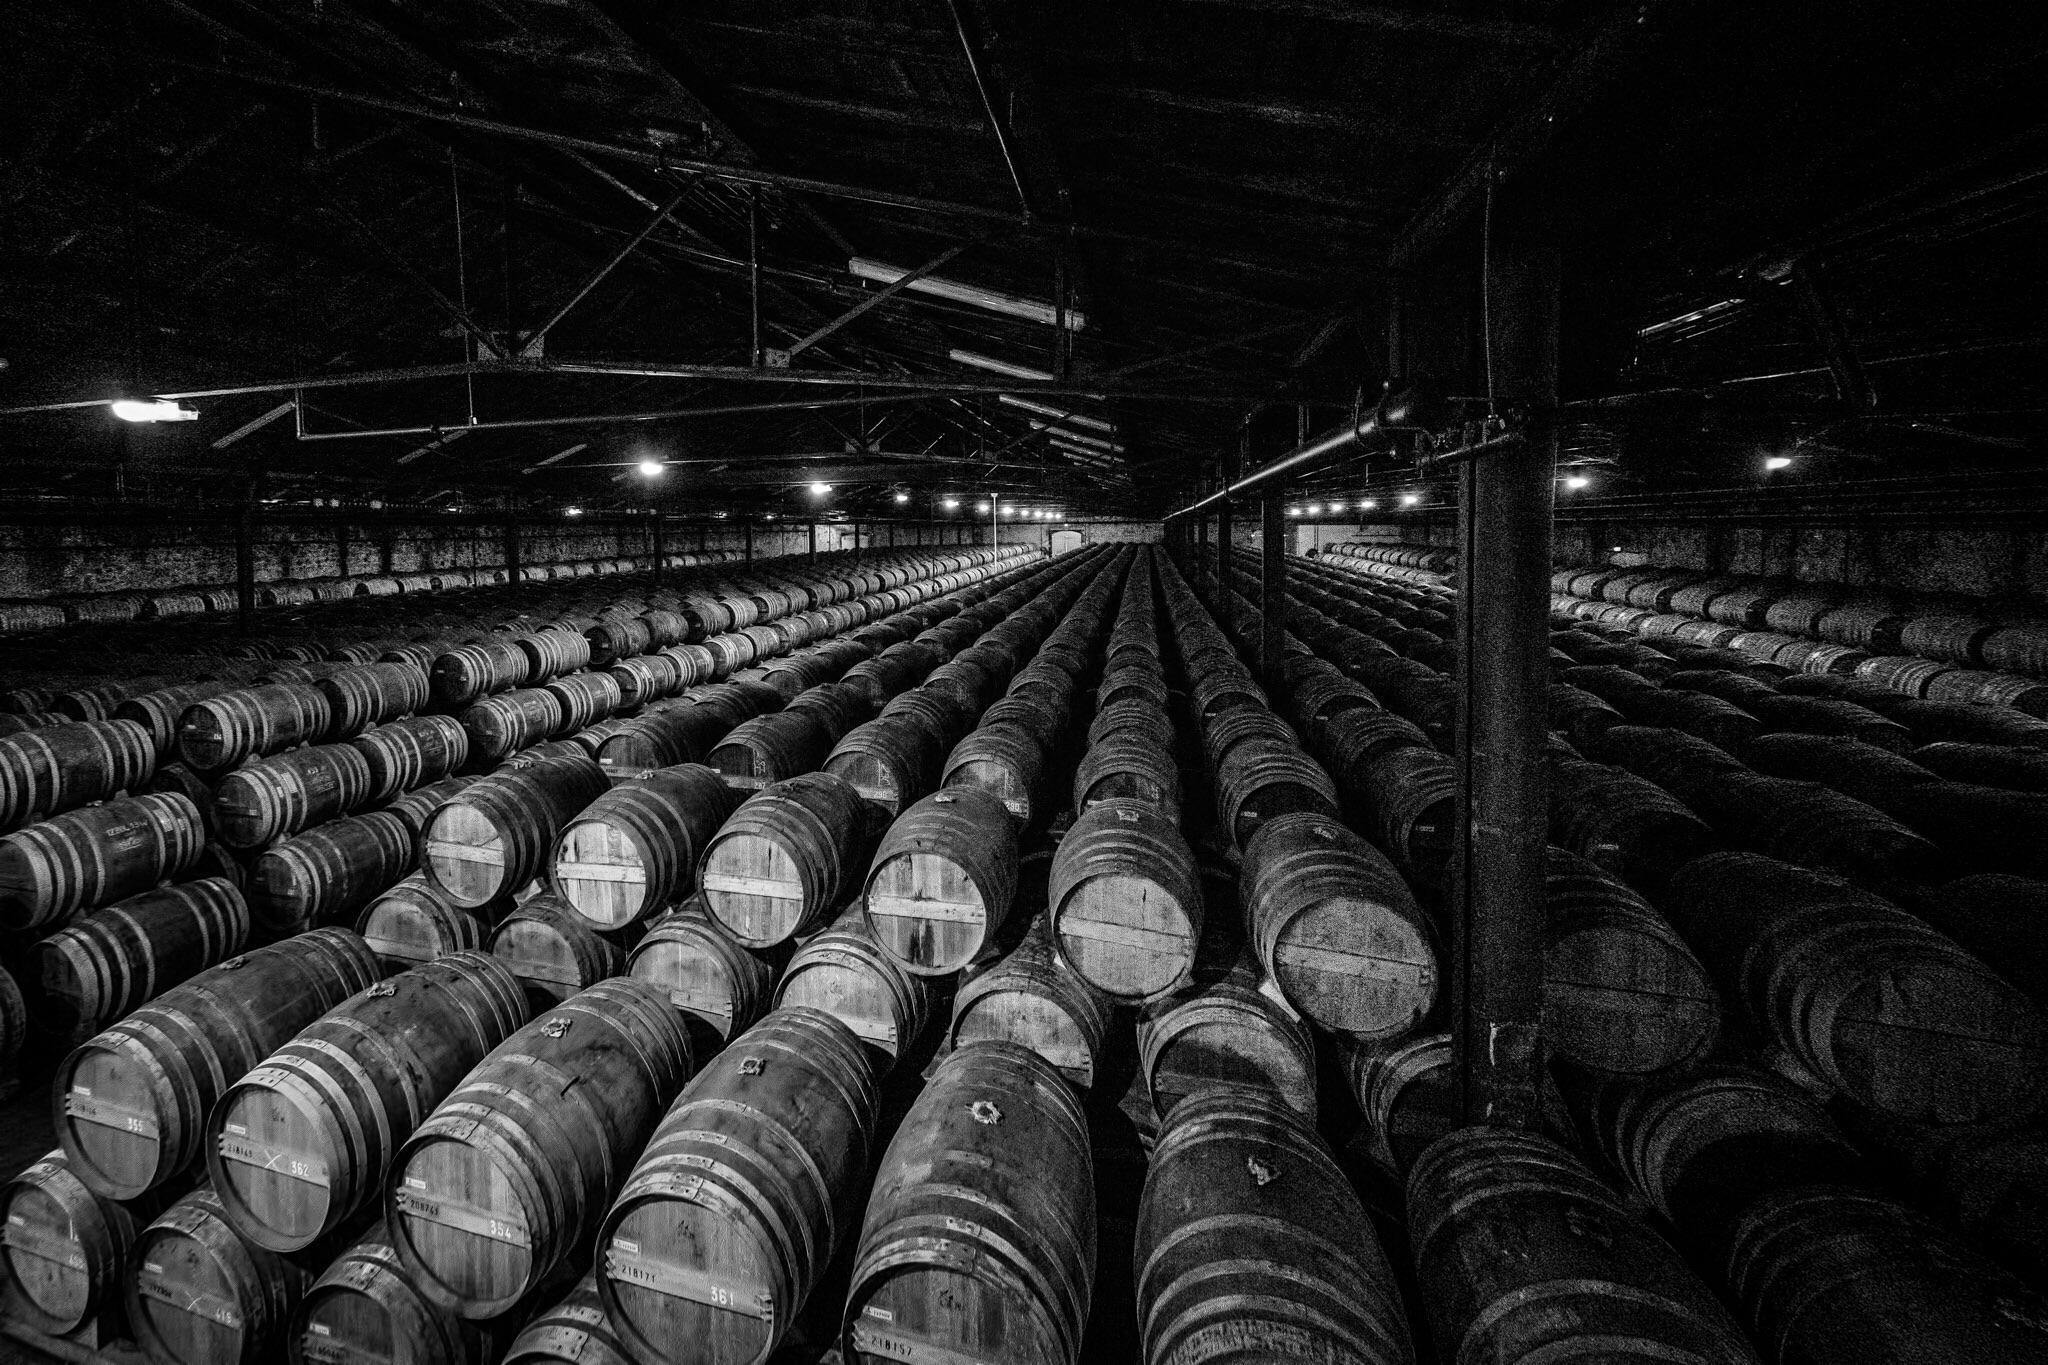 Picture of Barrels in Cognac, France